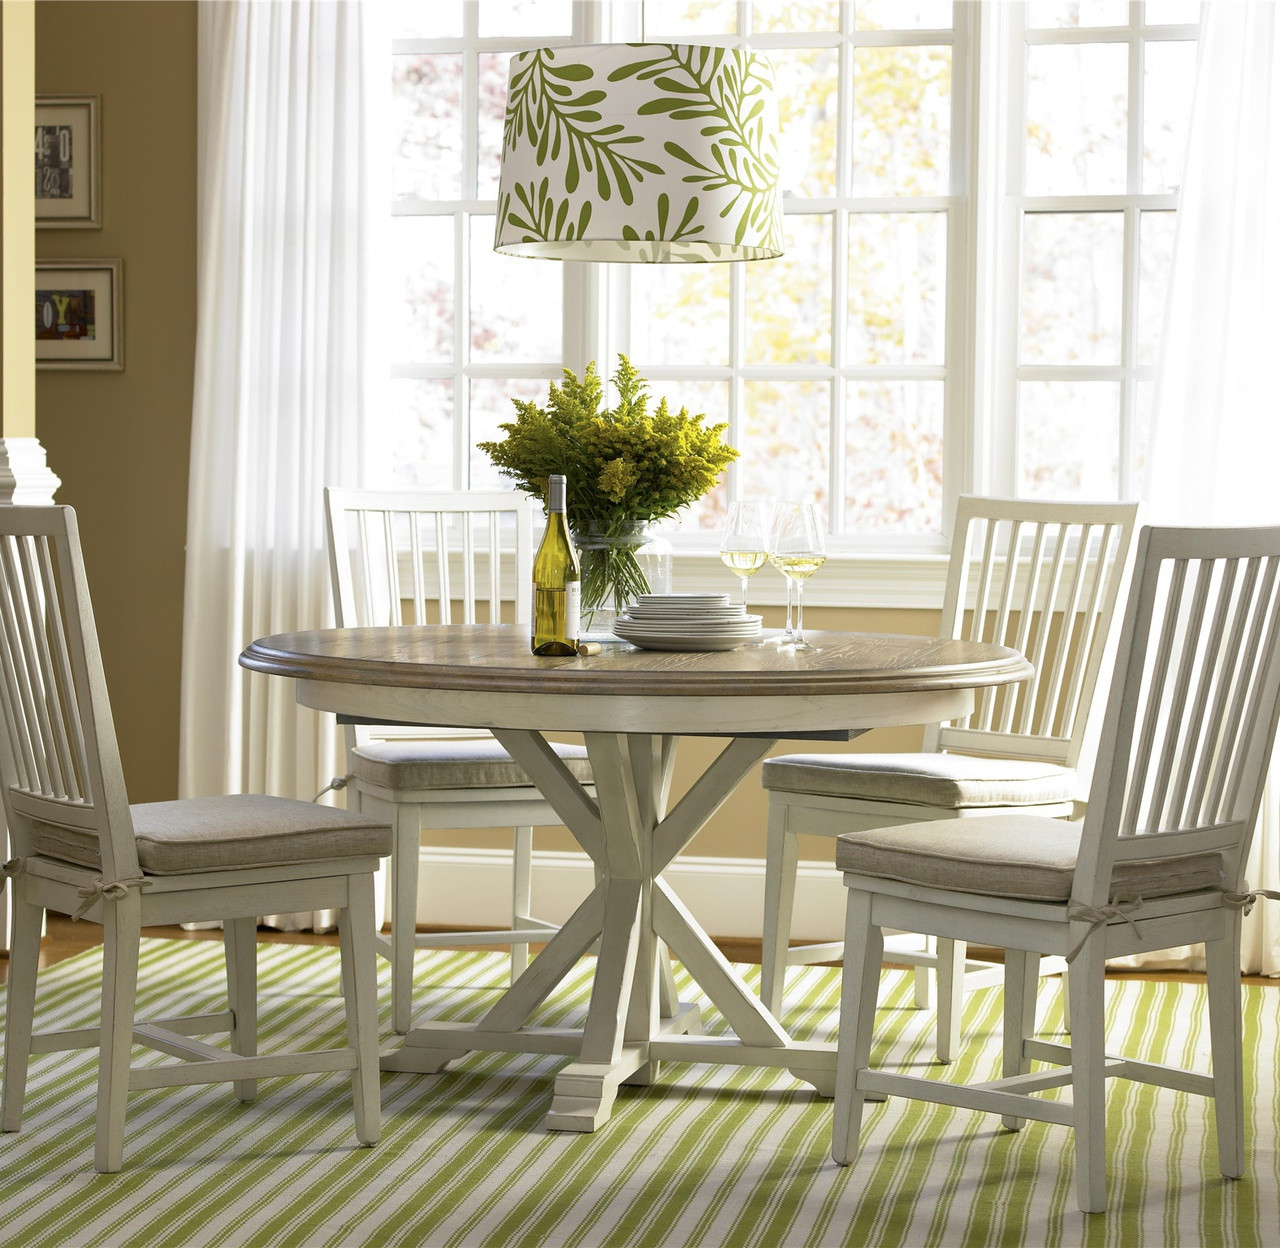 Coastal beach white oak round expandable dining table 54 zin home